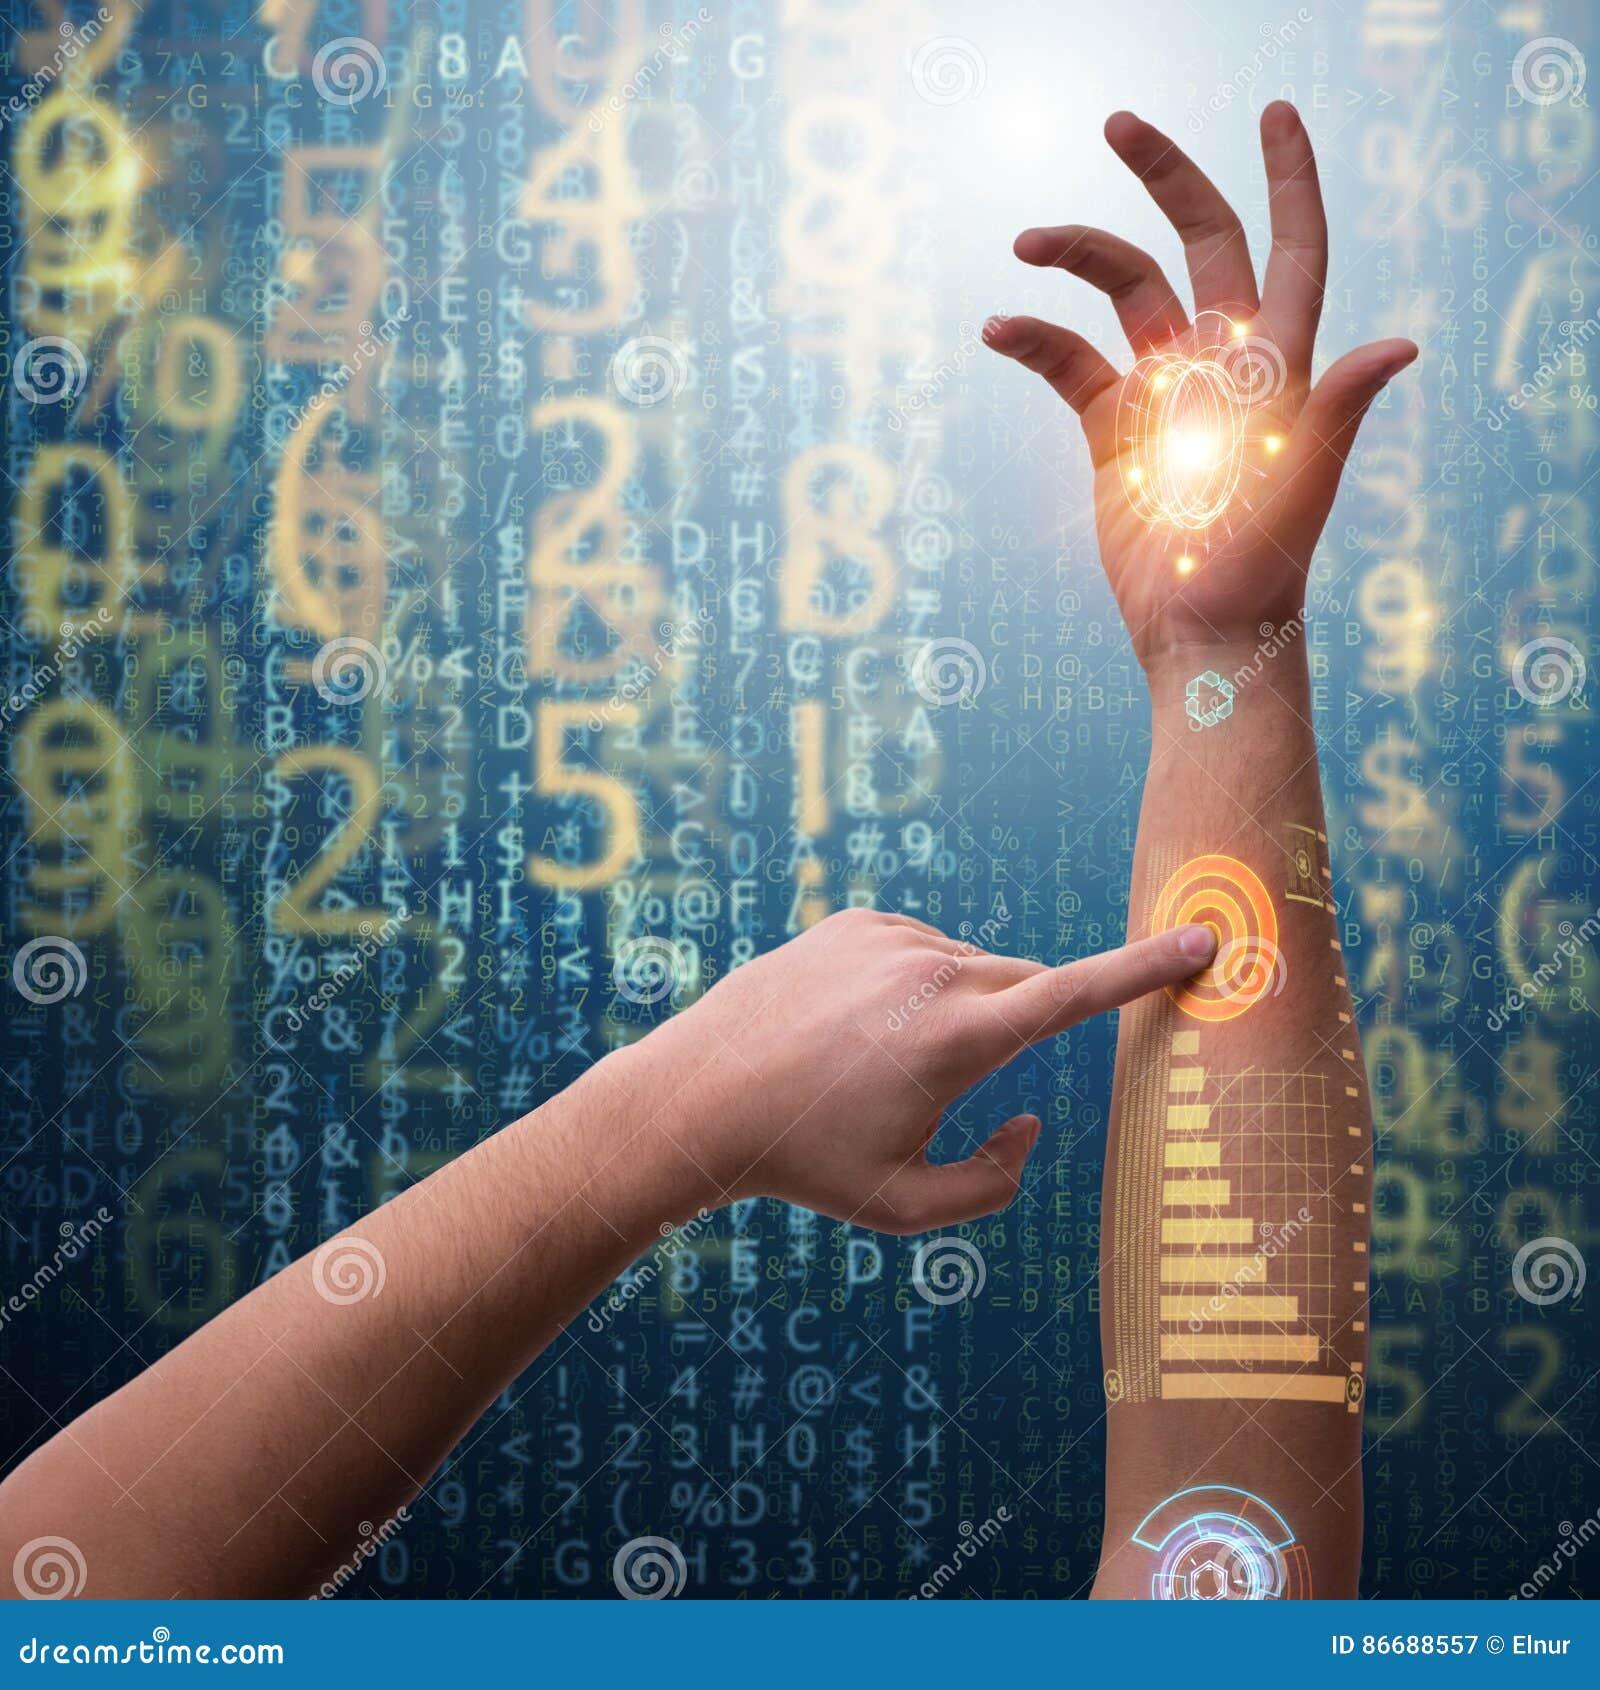 The human robotic hand in futuristic concept